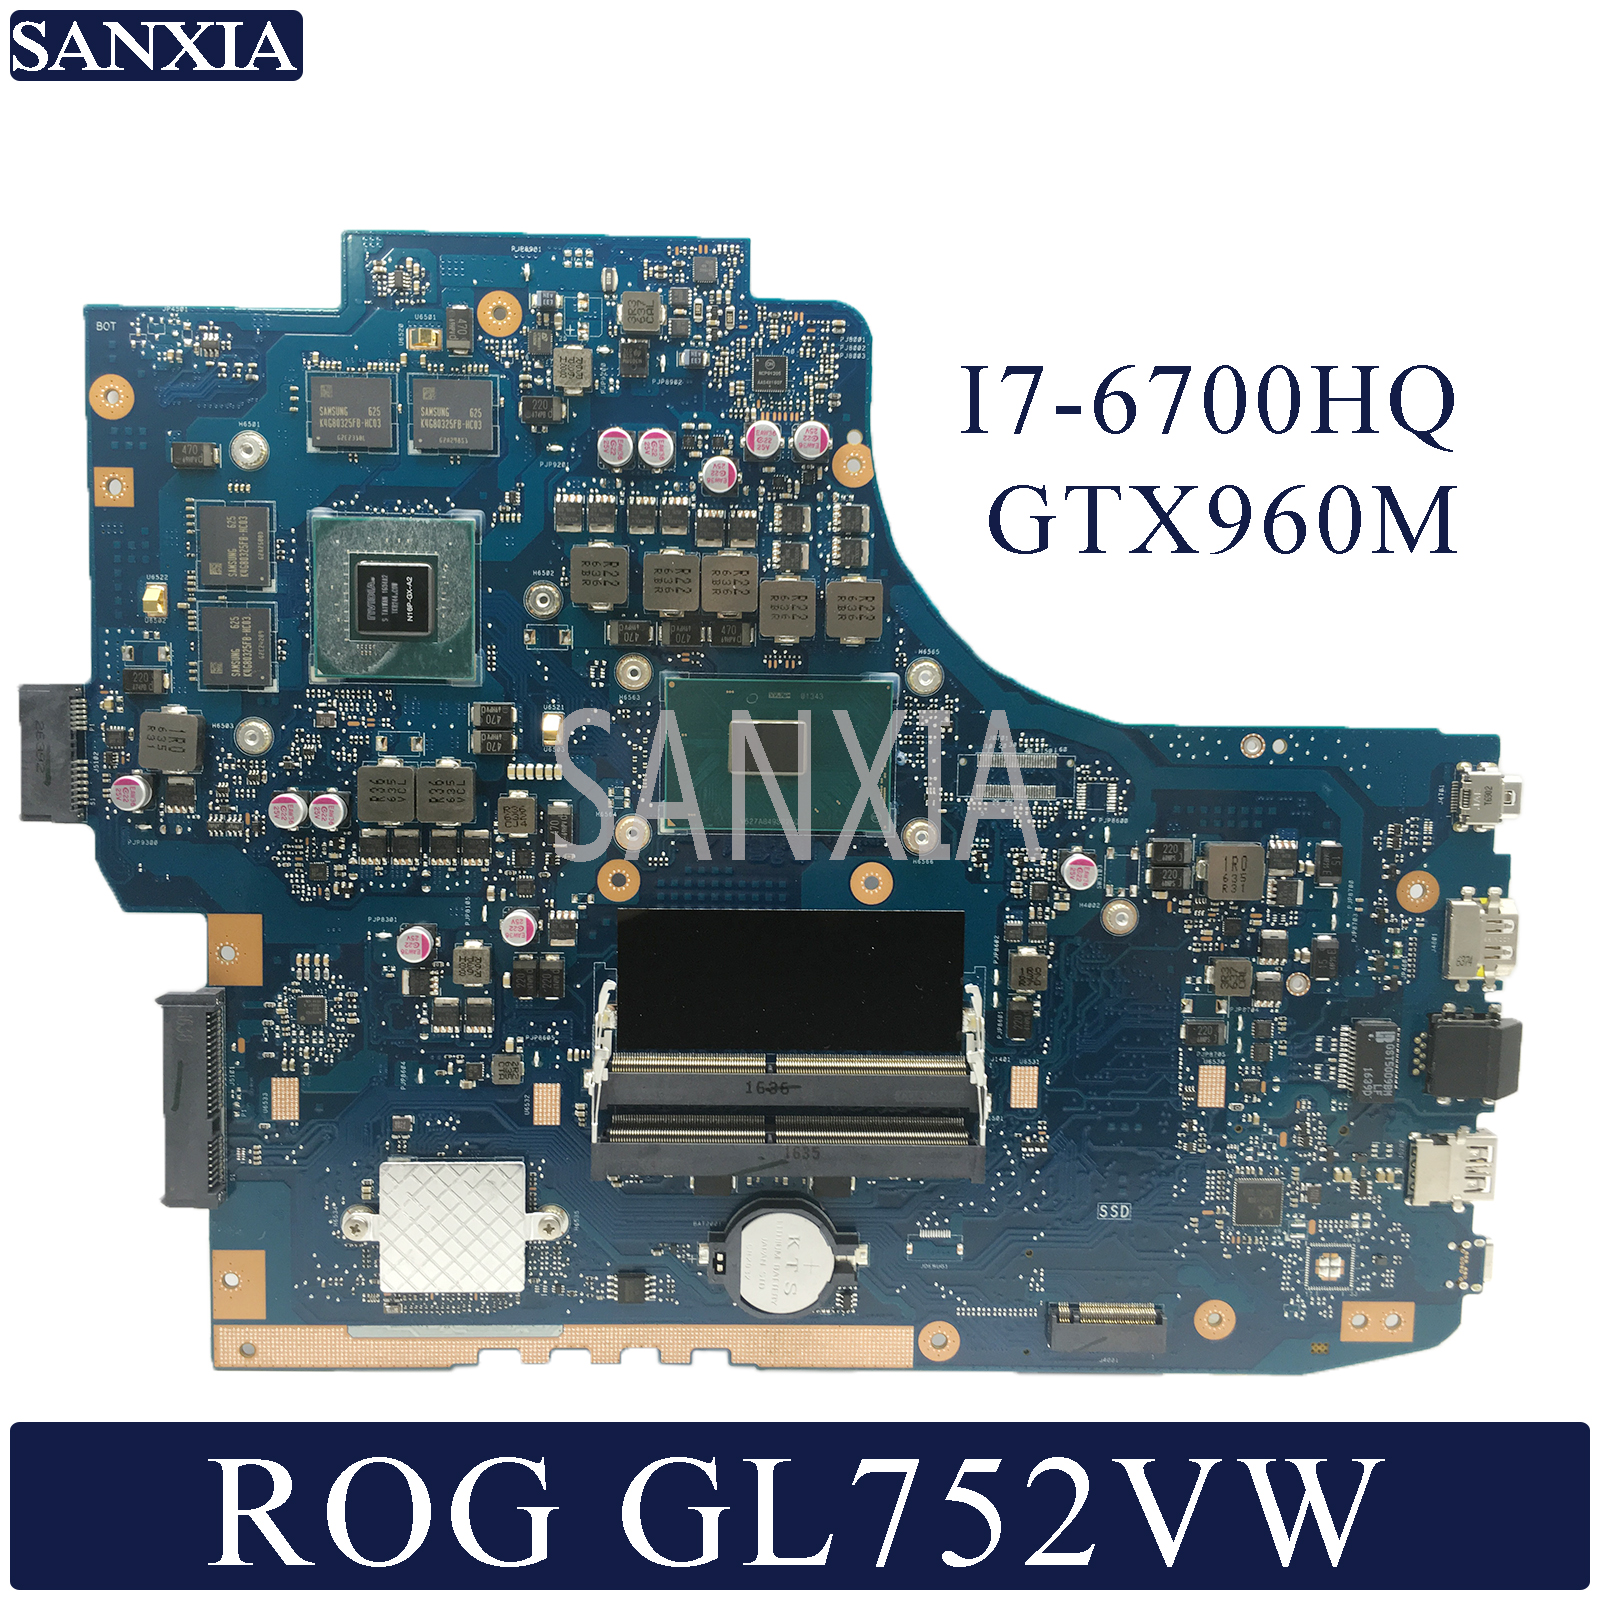 KEFU Laptop motherboard for ASUS ROG GL752VW Test original mainboard HM170 I7-6700HQ GTX960M-2GB/4GBKEFU Laptop motherboard for ASUS ROG GL752VW Test original mainboard HM170 I7-6700HQ GTX960M-2GB/4GB